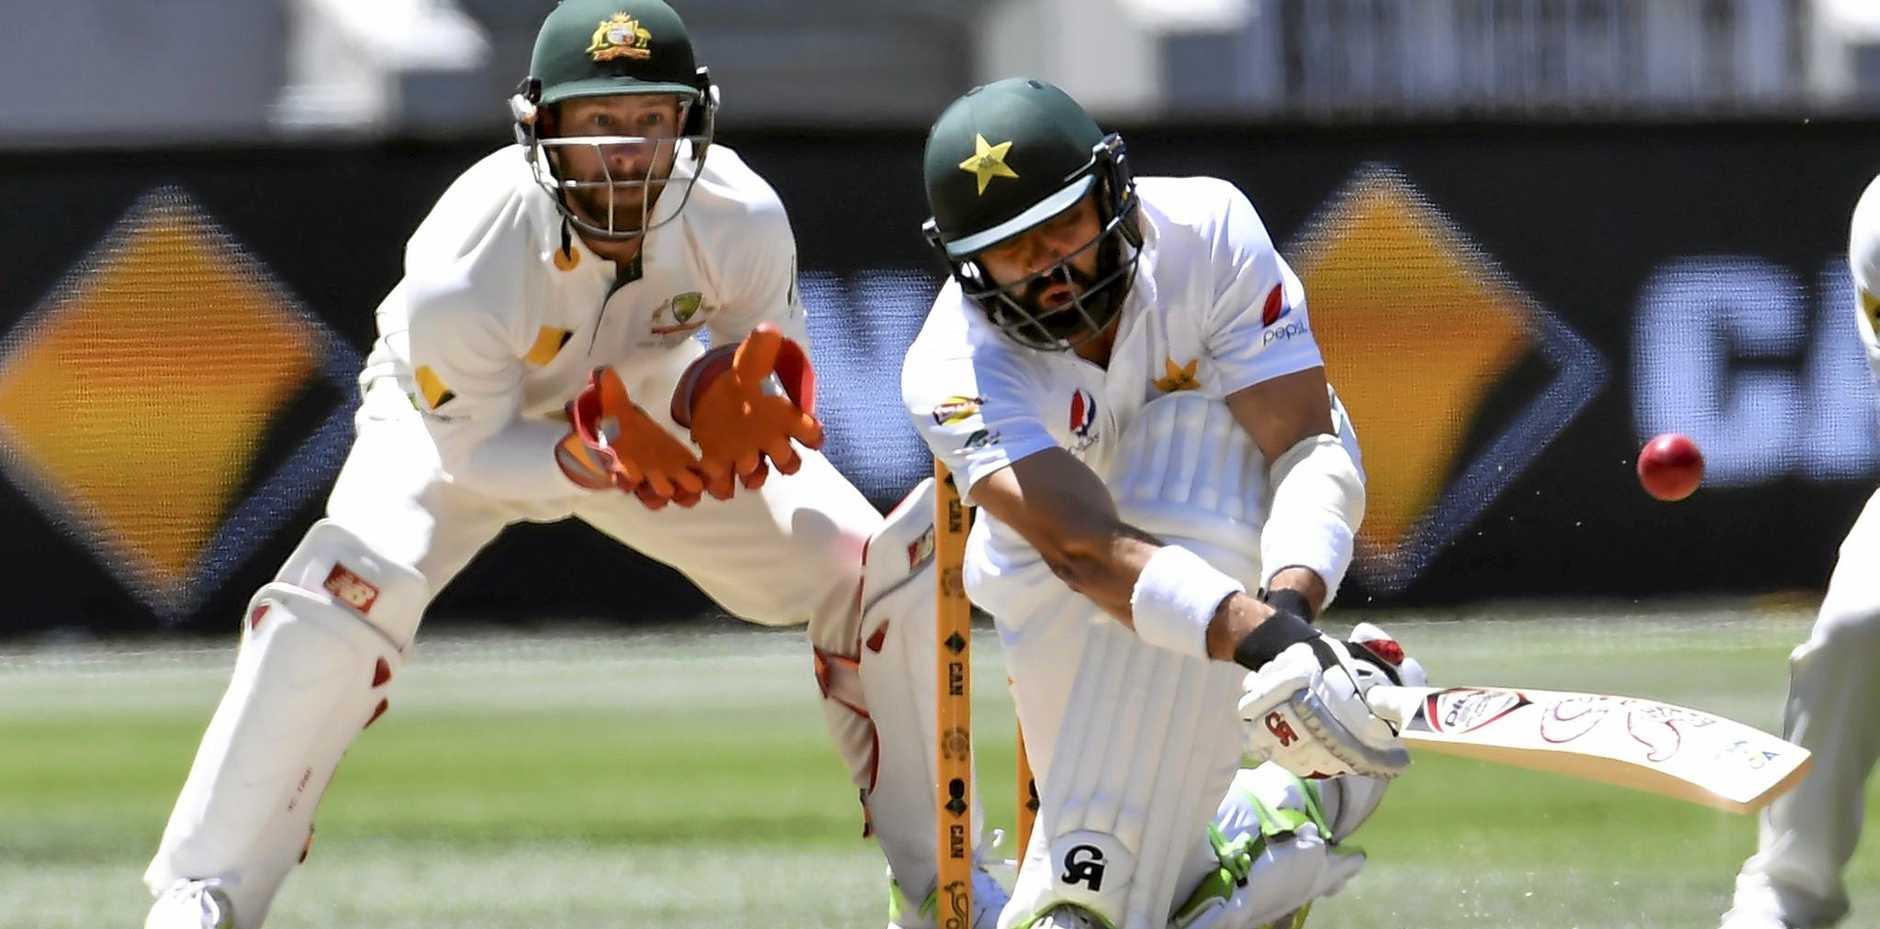 Australia's Matthew Wade (left) watches Pakistan's Misbah-ul-Haq play a sweep shot at the MCG.